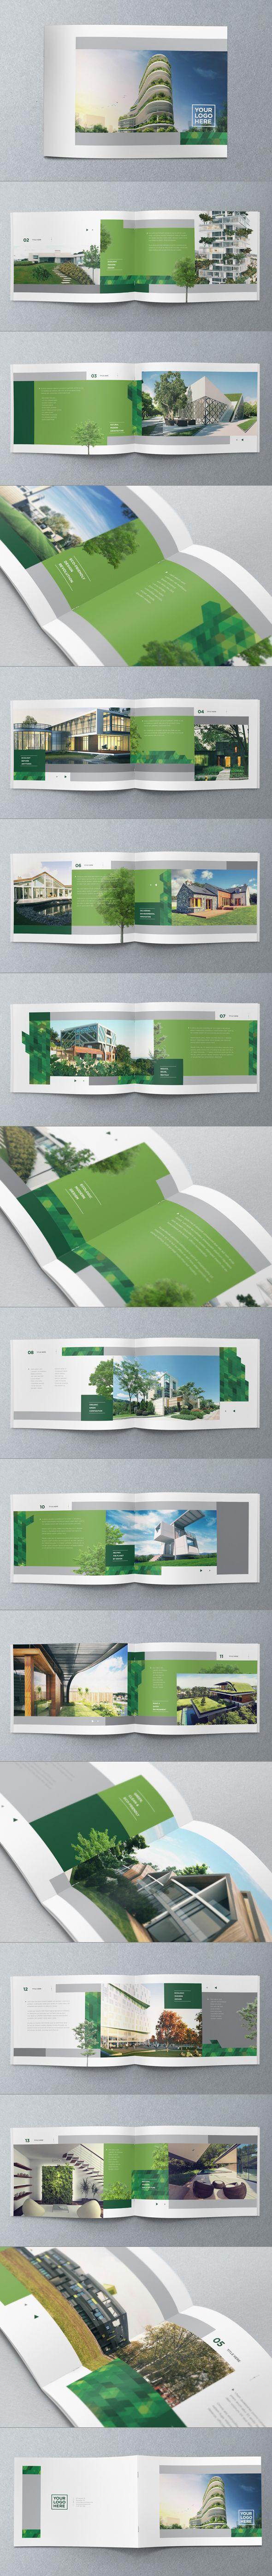 Brochure Design by Abra Design, via Behance